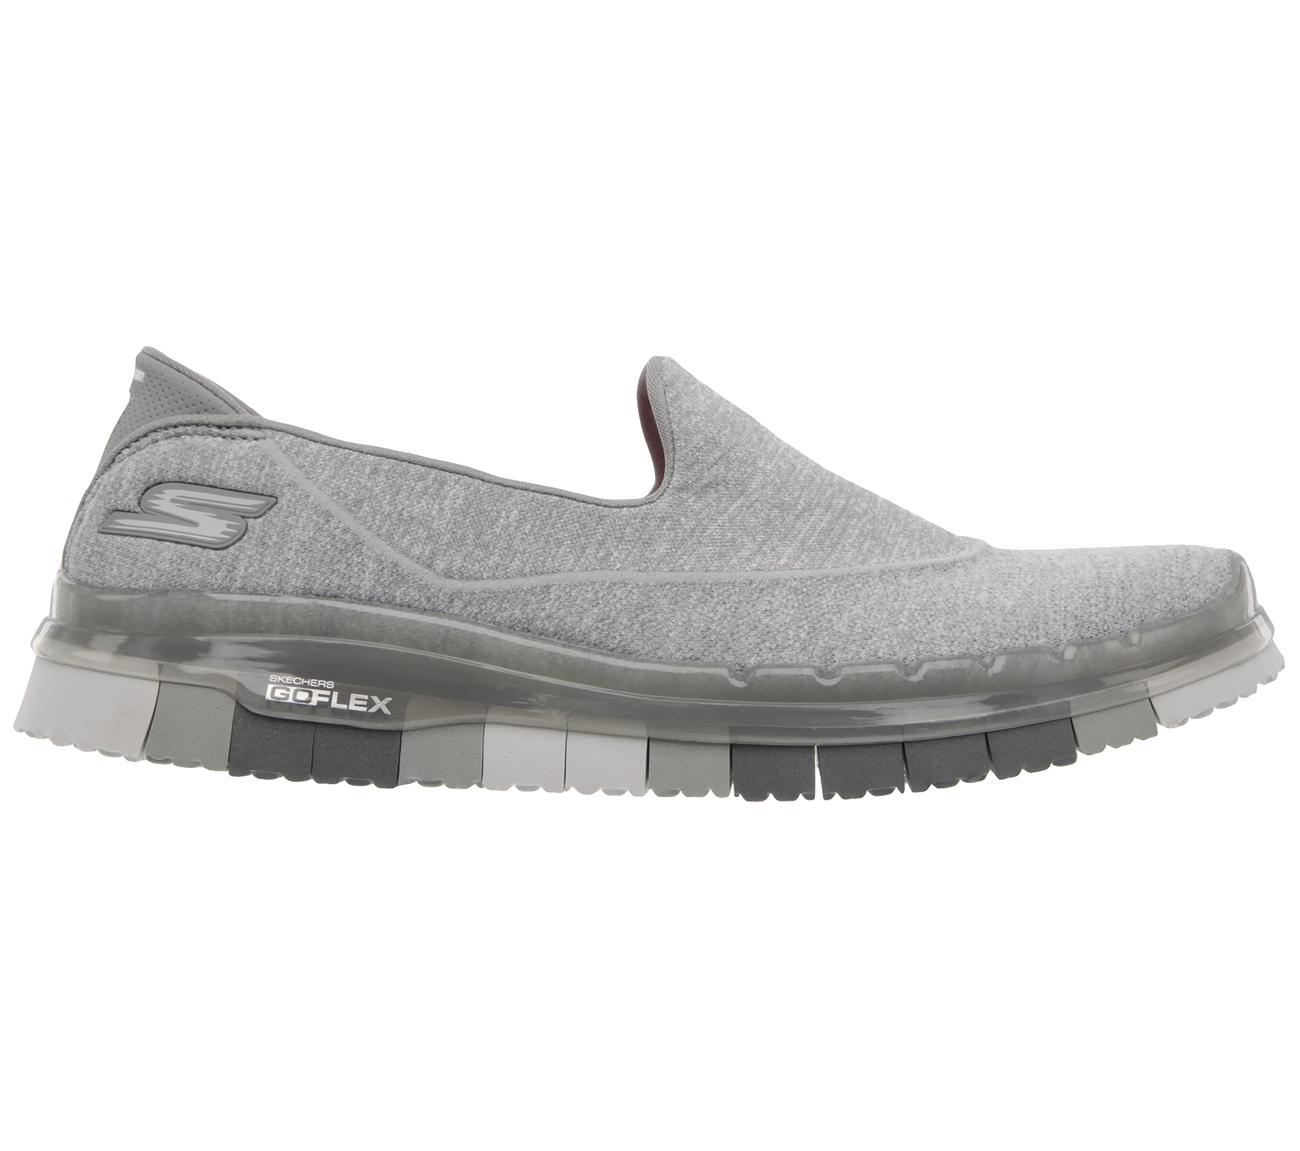 Skechers-Go Flex Slip On-GRY-$149.90